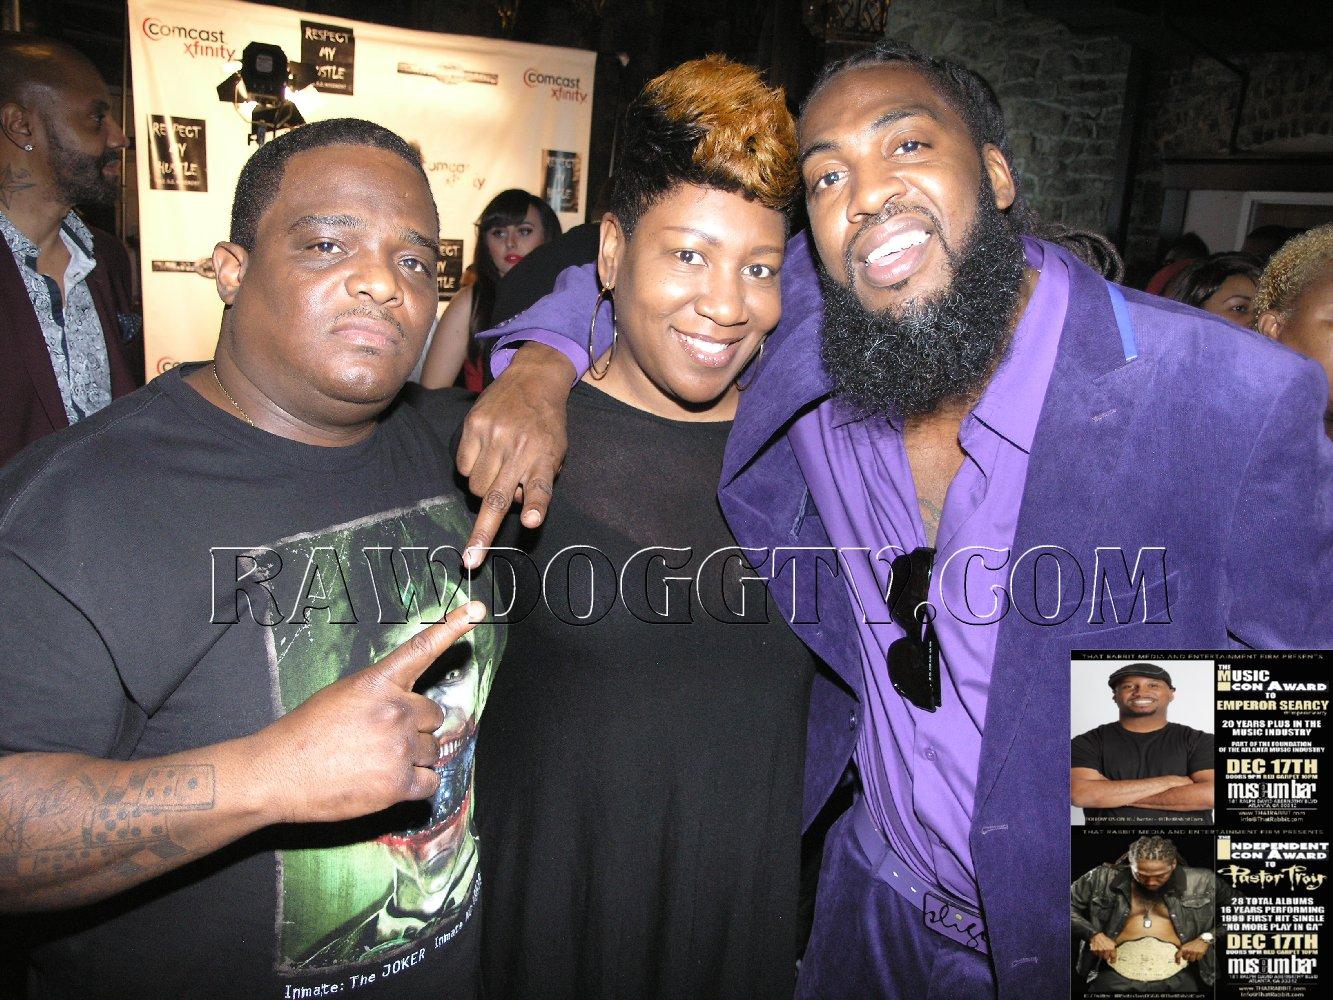 ThatRabbit Magazine Photos-ATL Legends Reunion-The Music Icon Award-Museum Bar Atlanta-Ray Hamilton- dec 17 2015 RAWDOGGTV 305-490-2182 (117)